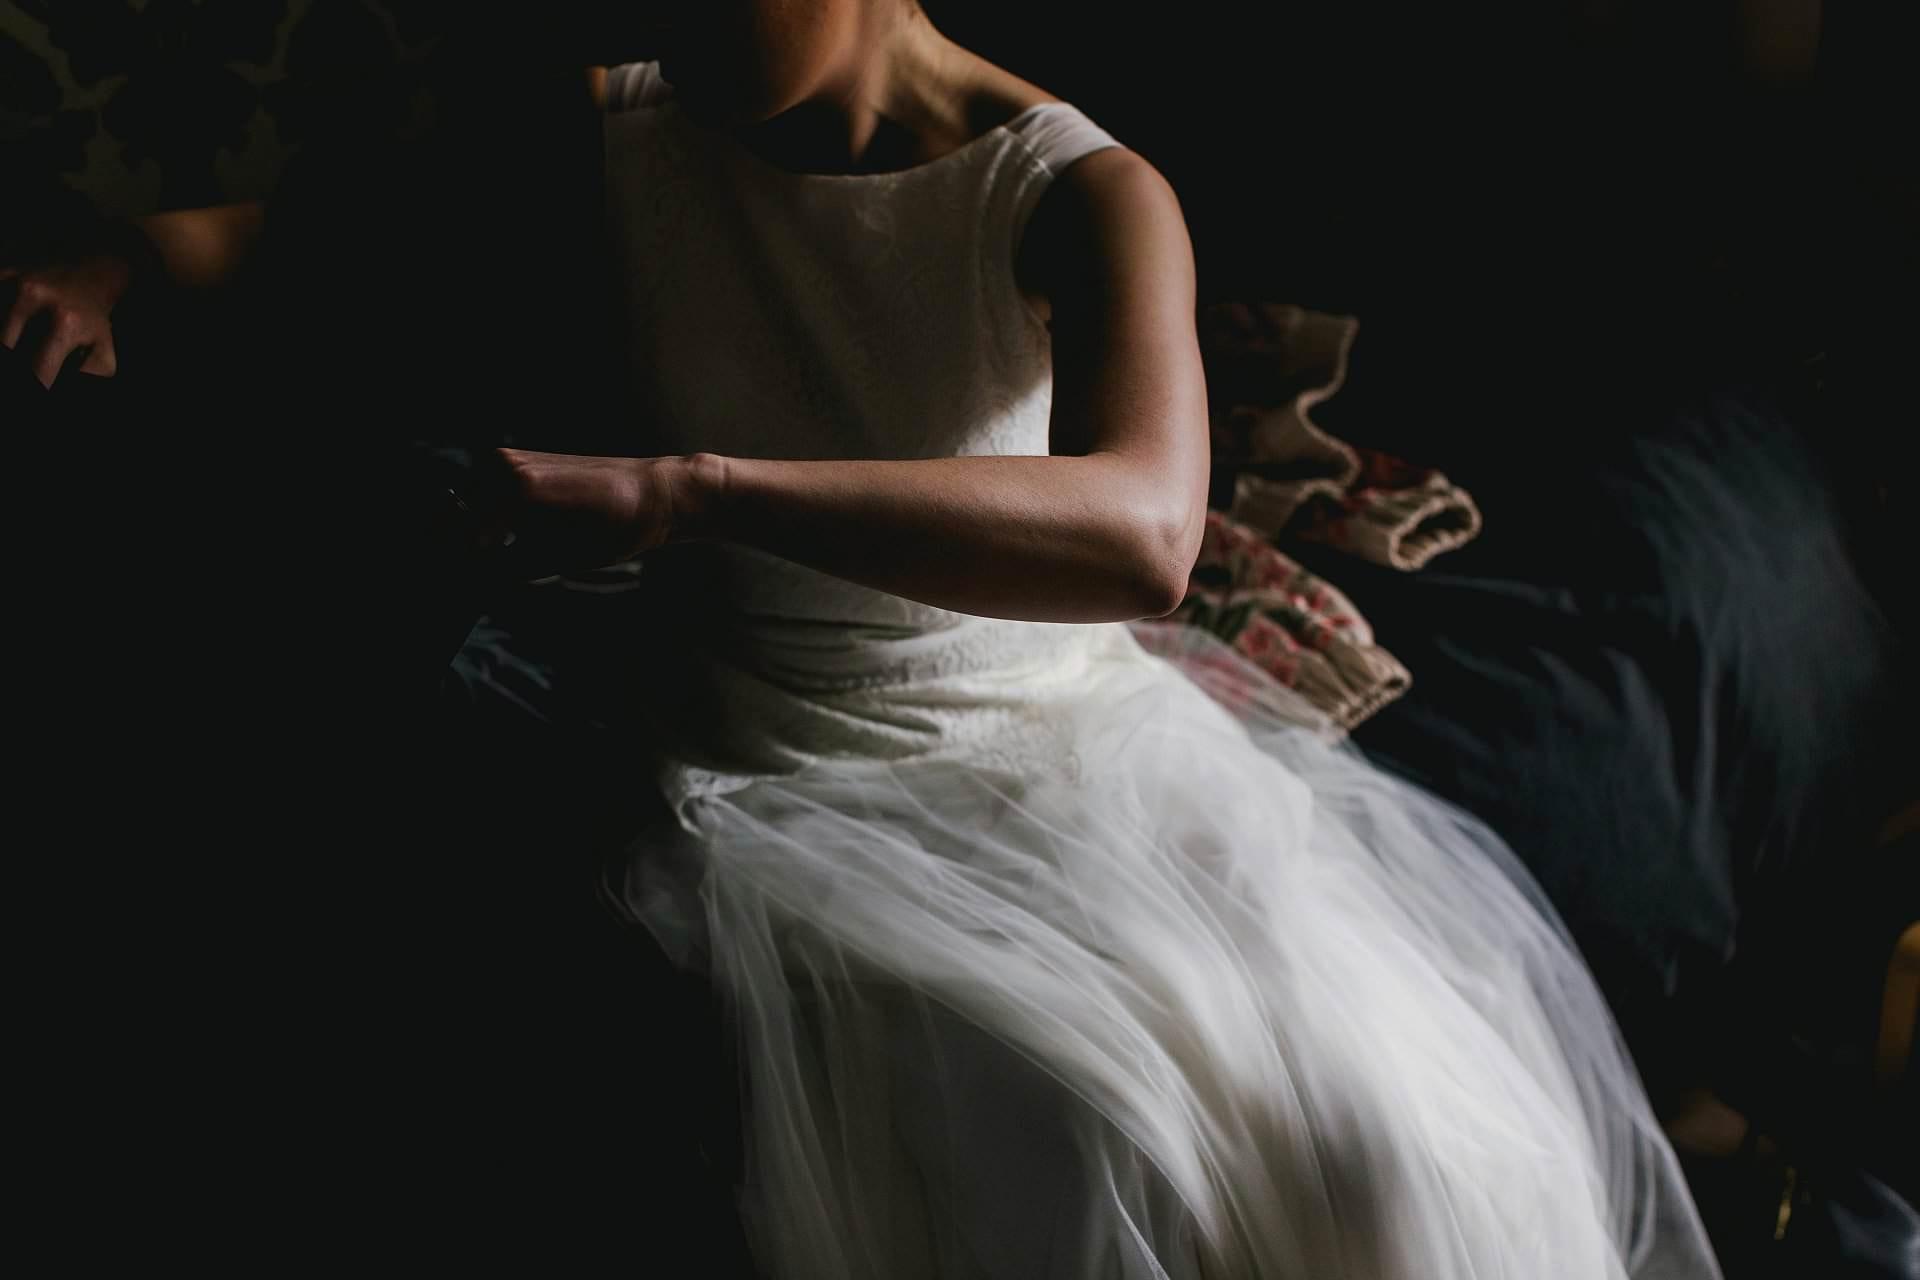 Light on brides arm and wedding dress